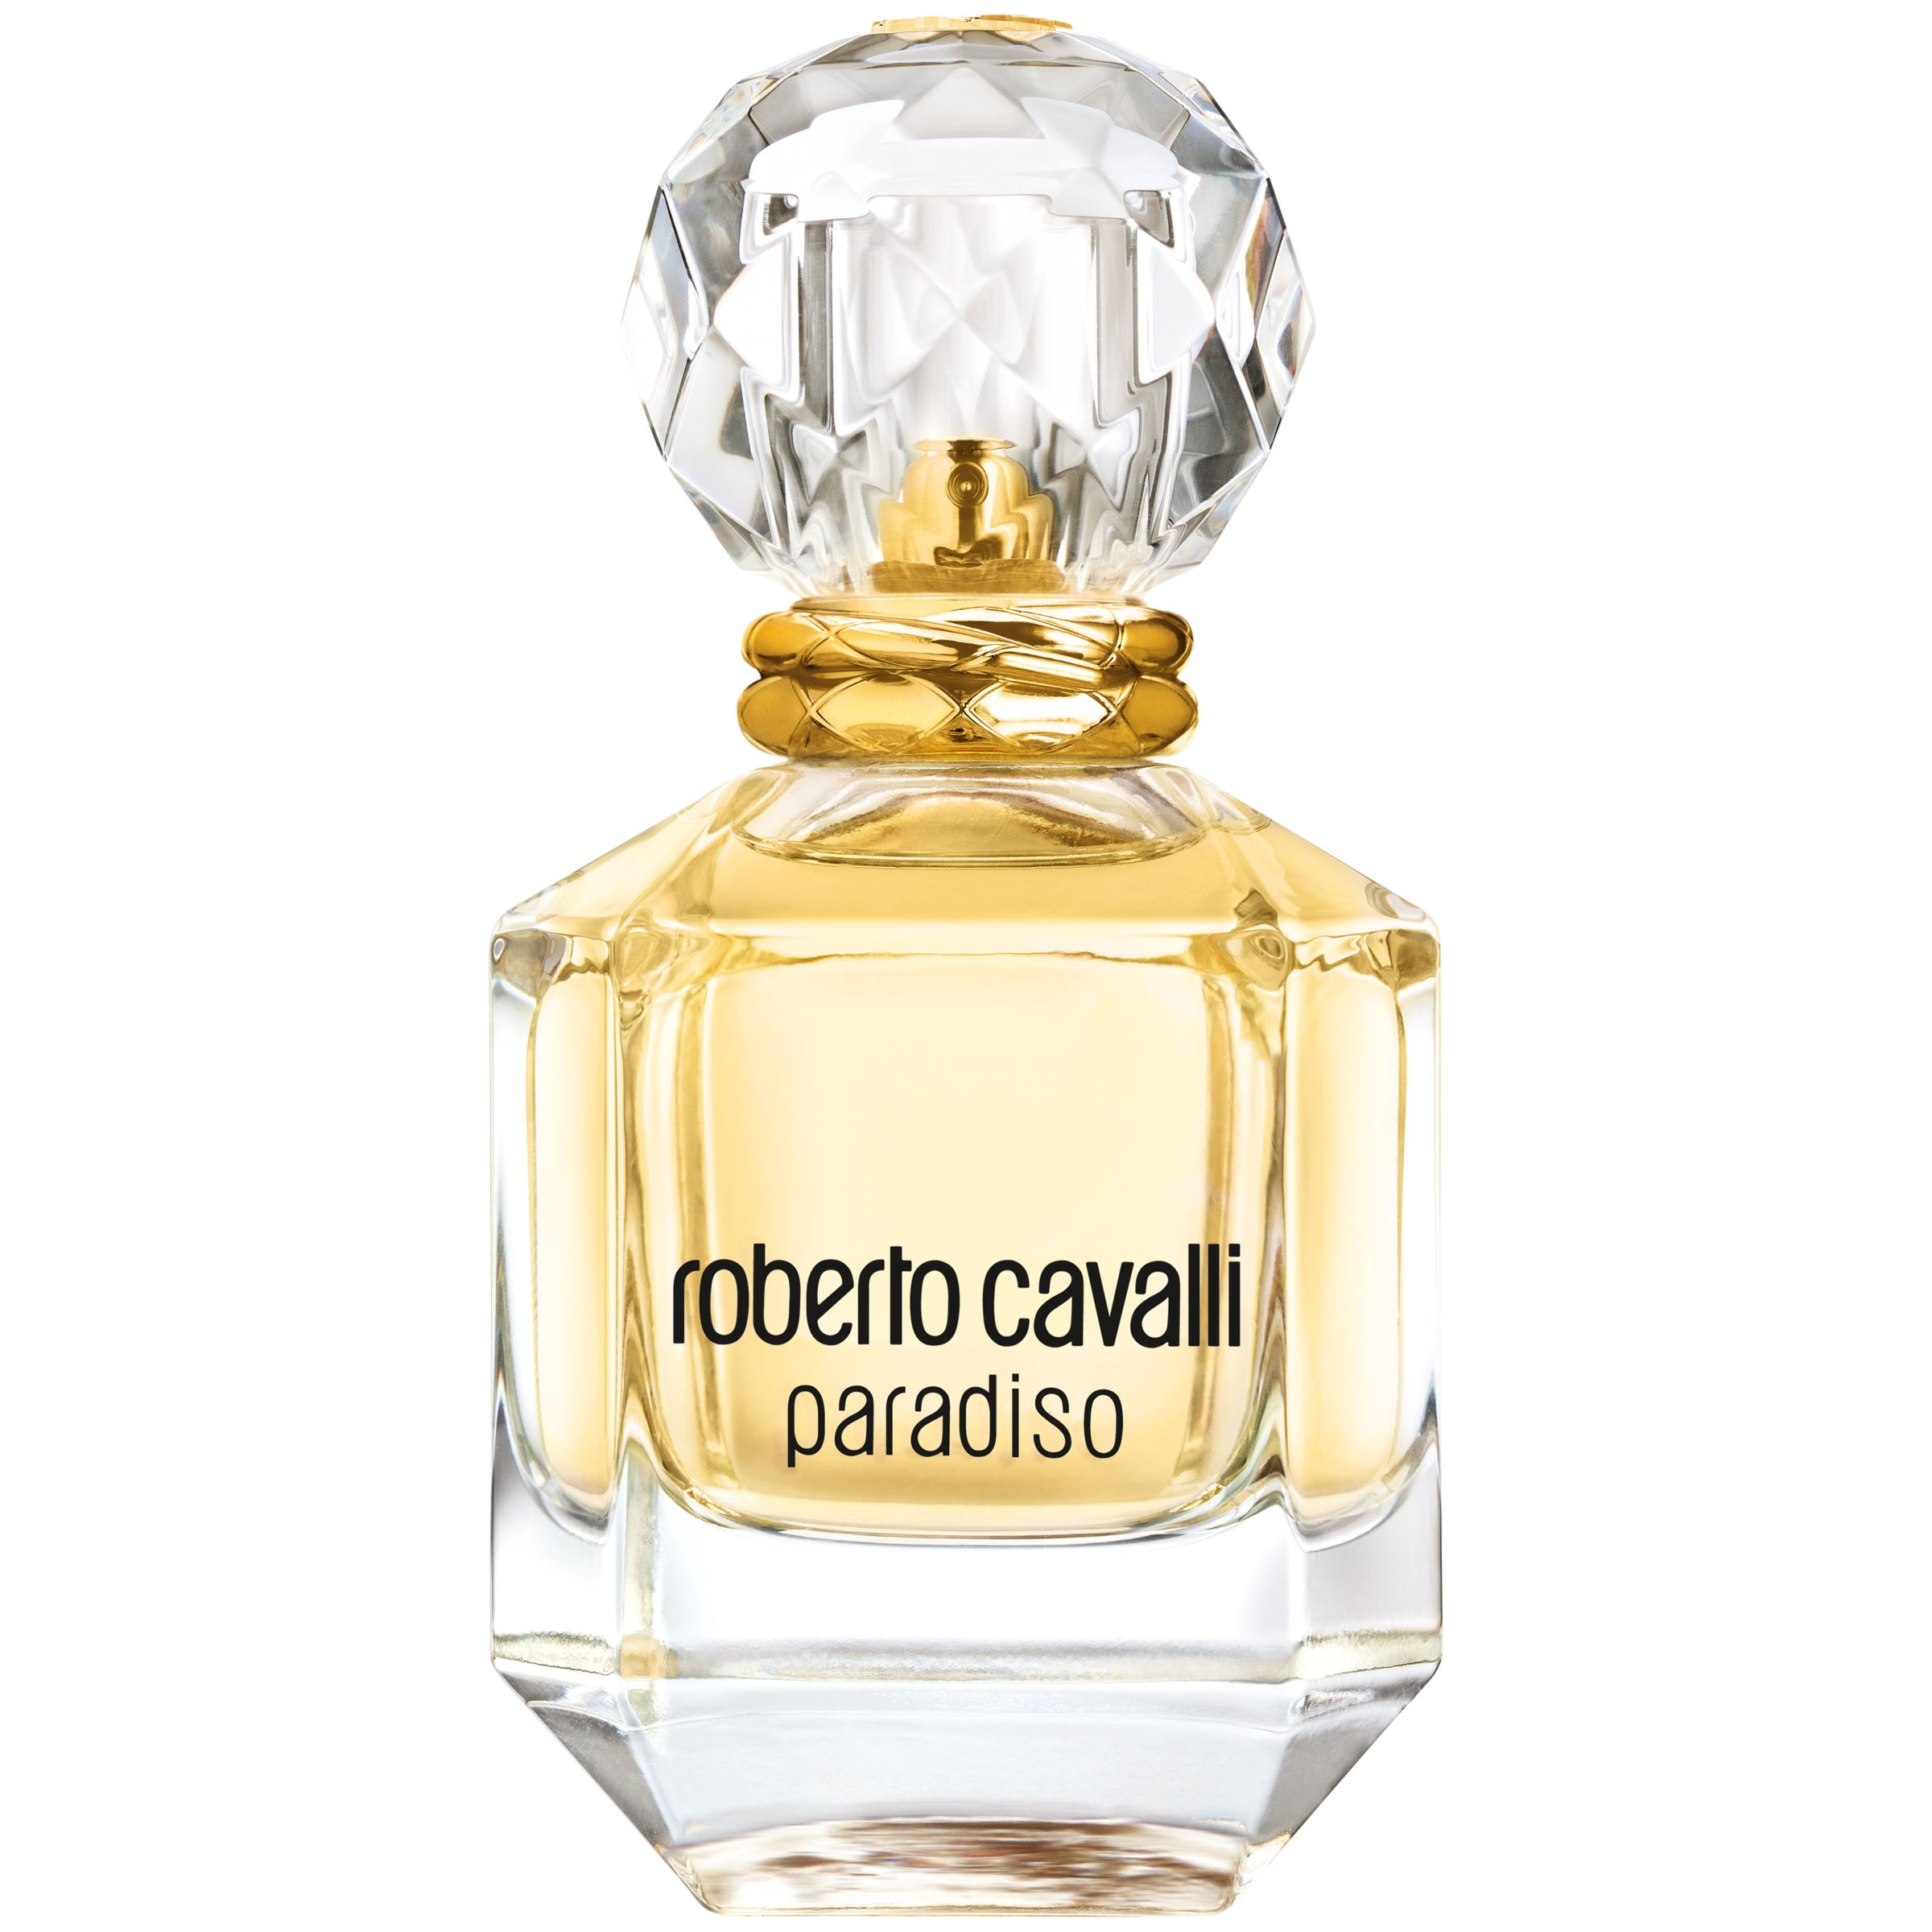 Roberto Cavalli Roberto Cavalli Paradiso Eau de Parfum